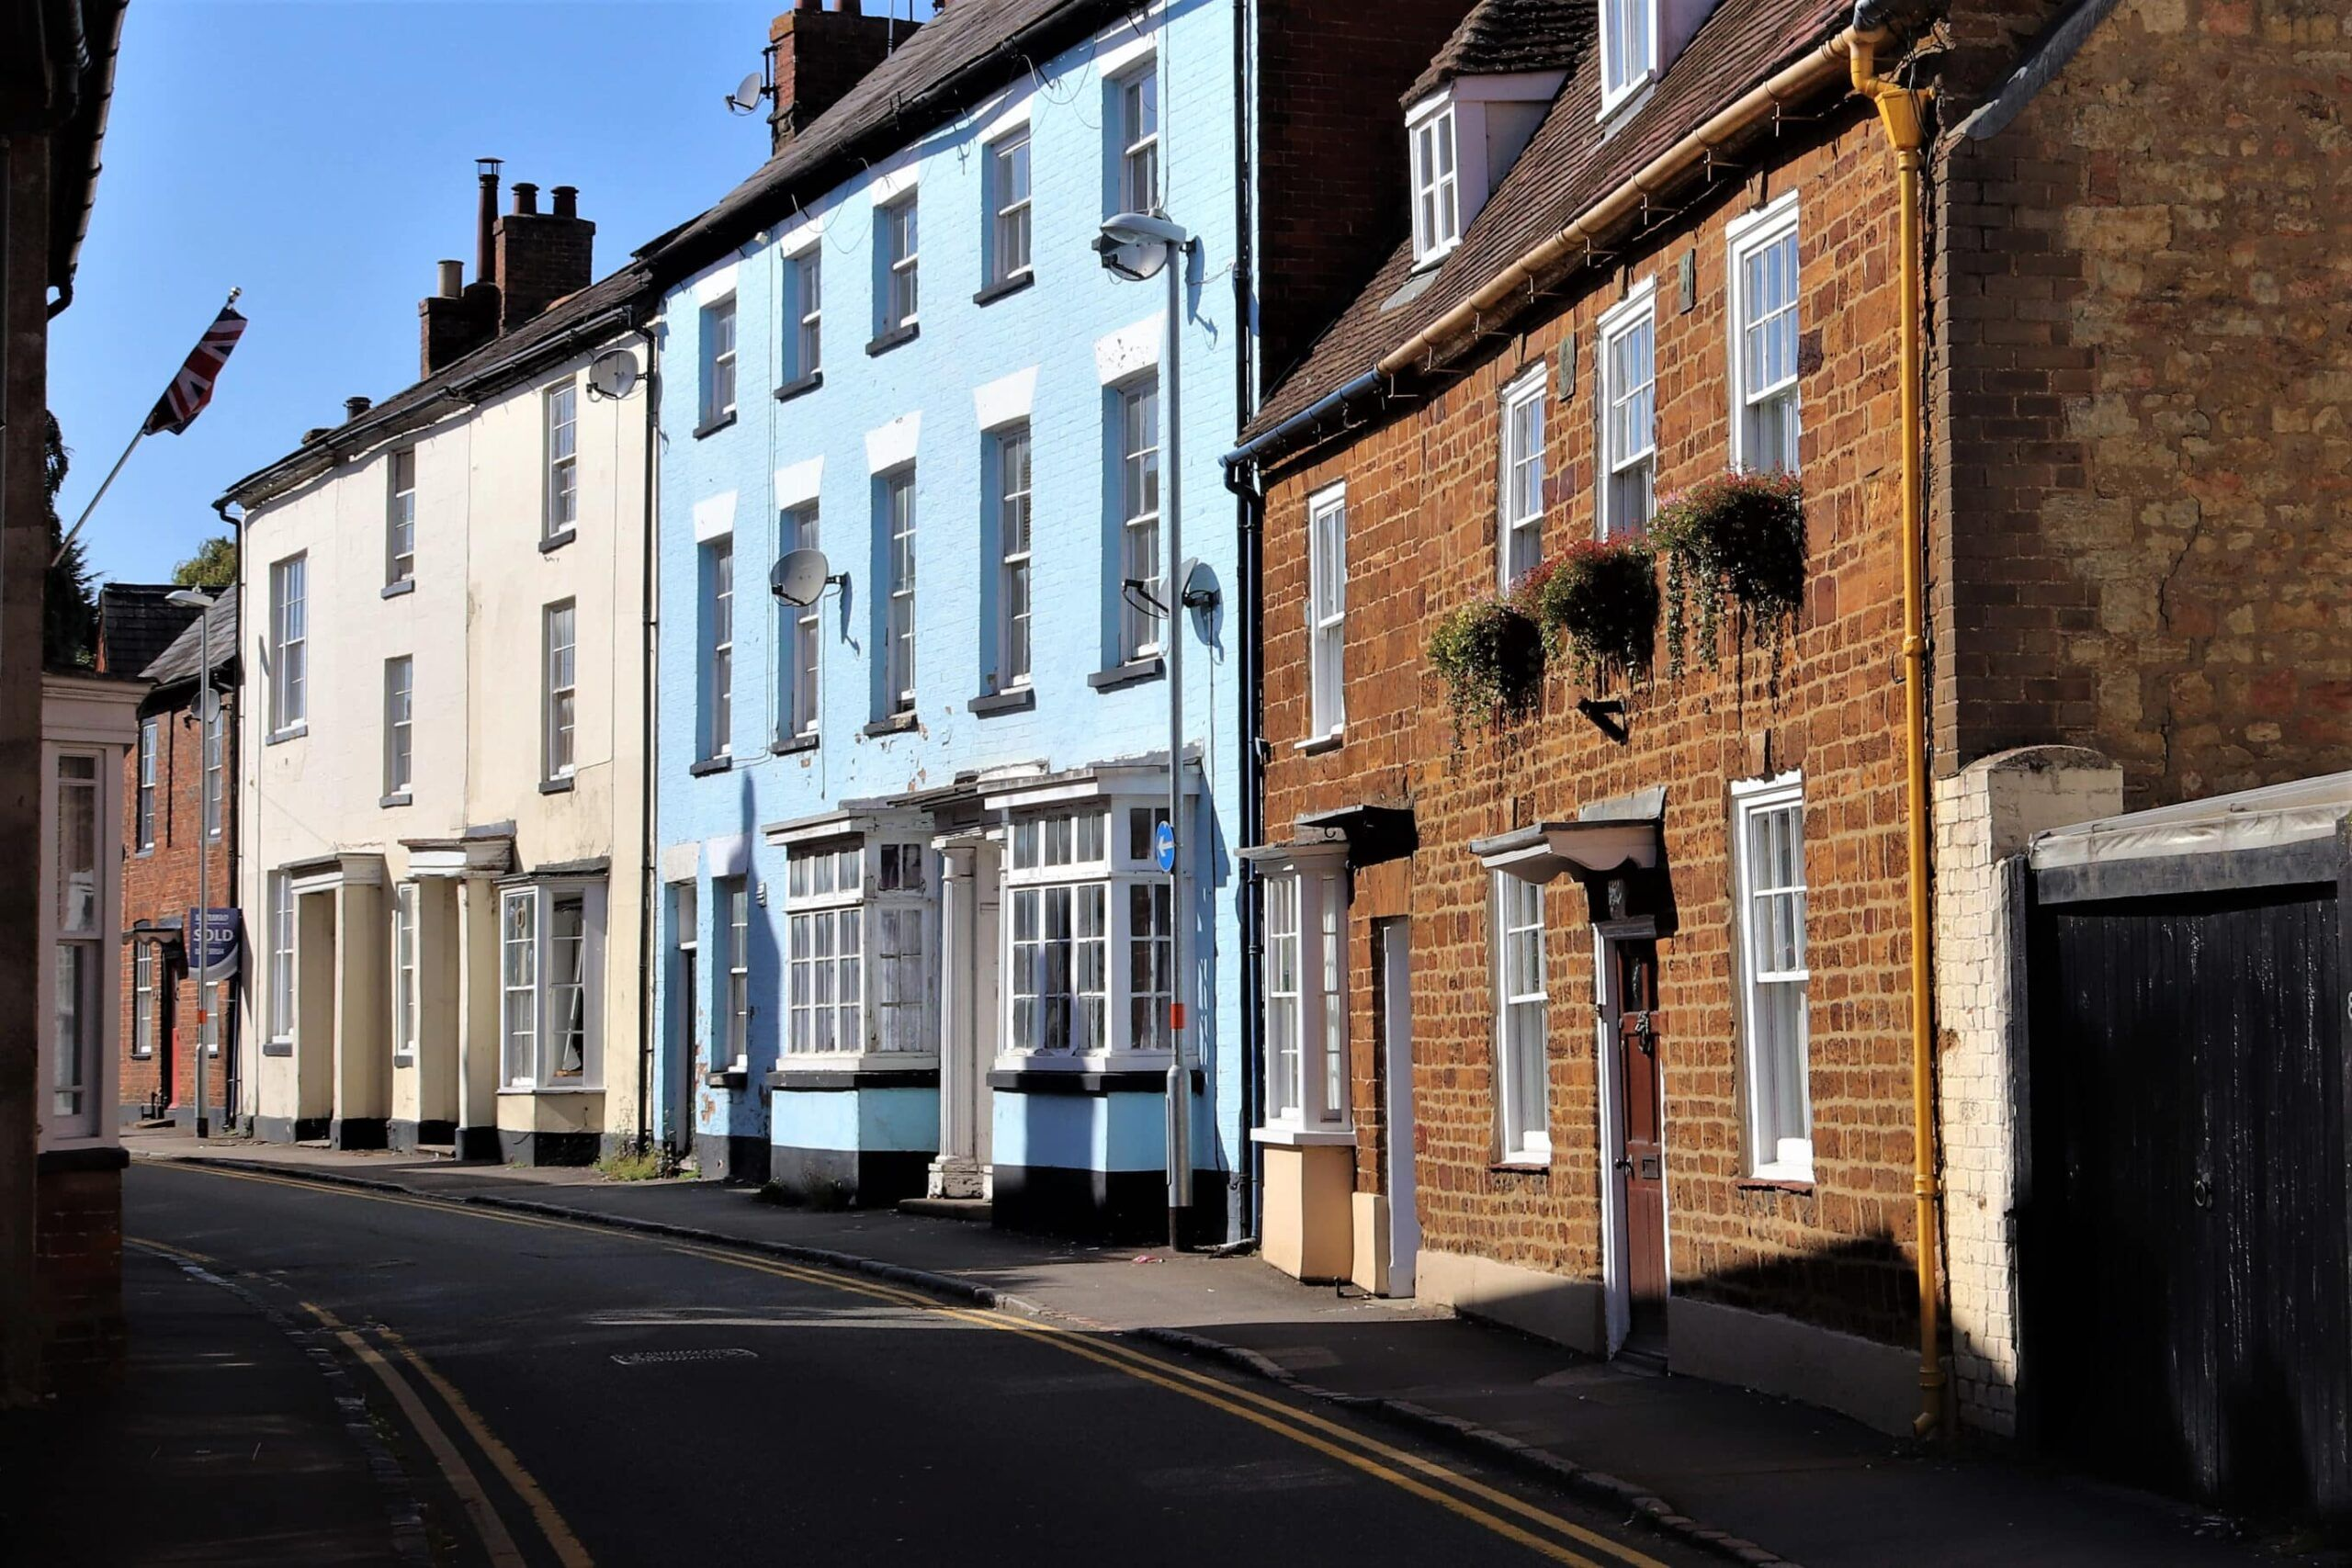 Street in Towcester